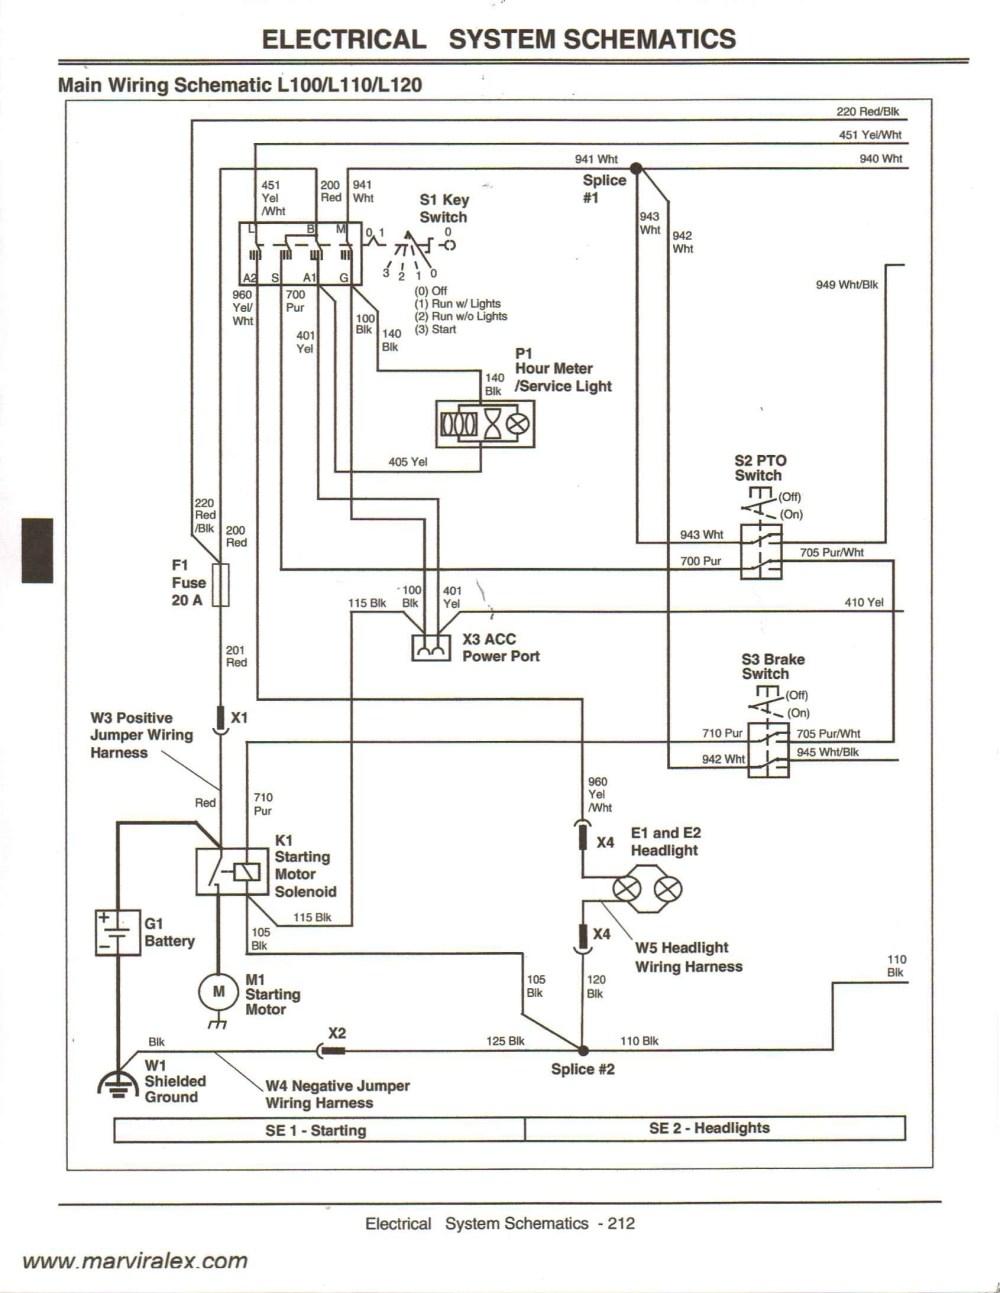 medium resolution of ignition wiring diagram john deere 318 wiring diagrams john deere 318 ignition wiring diagram ignition wiring diagram john deere 318